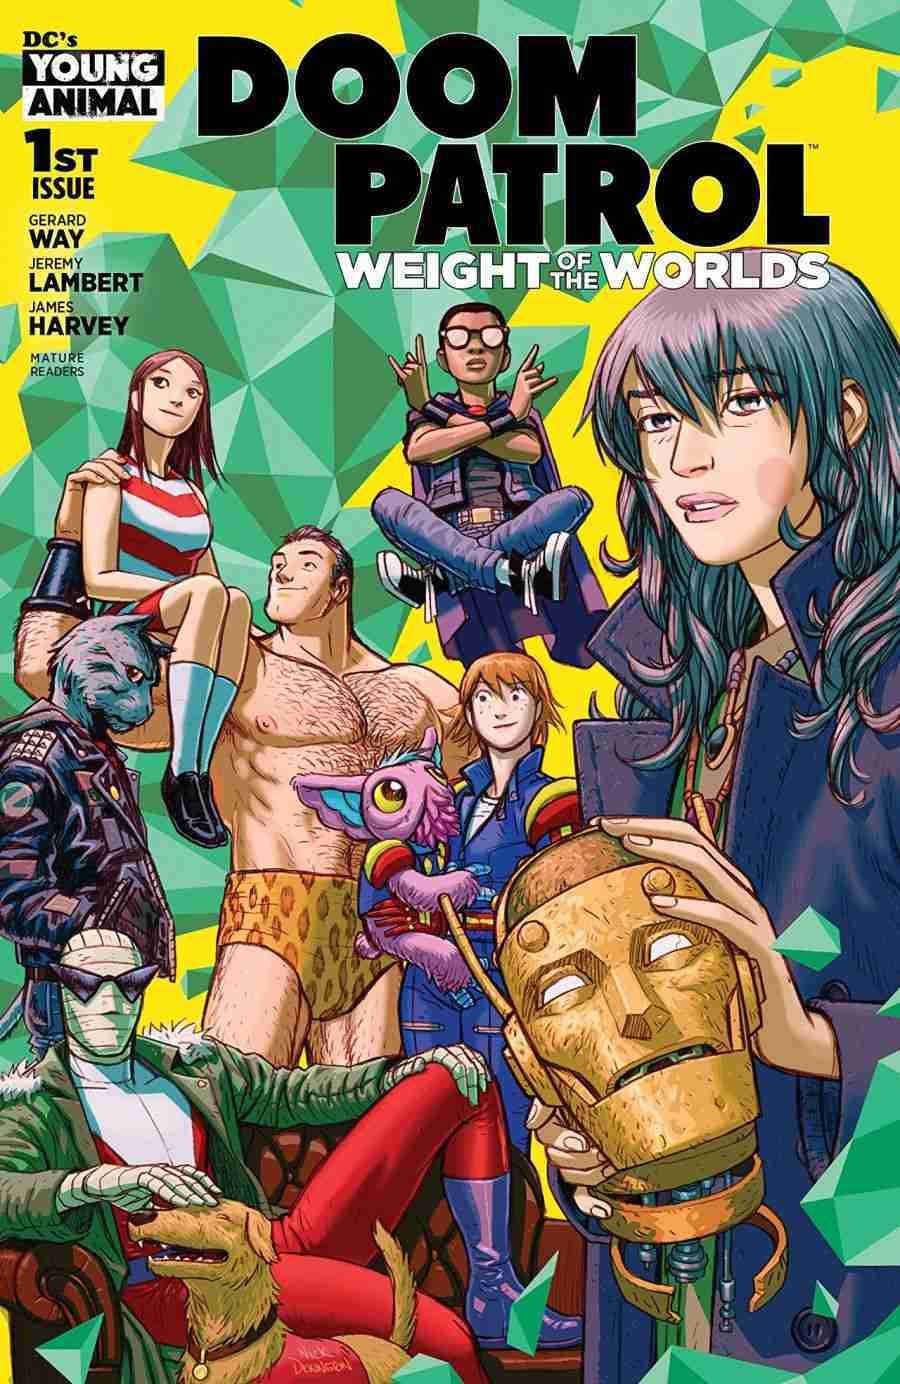 Doom Patrol Weight of the Worlds #1